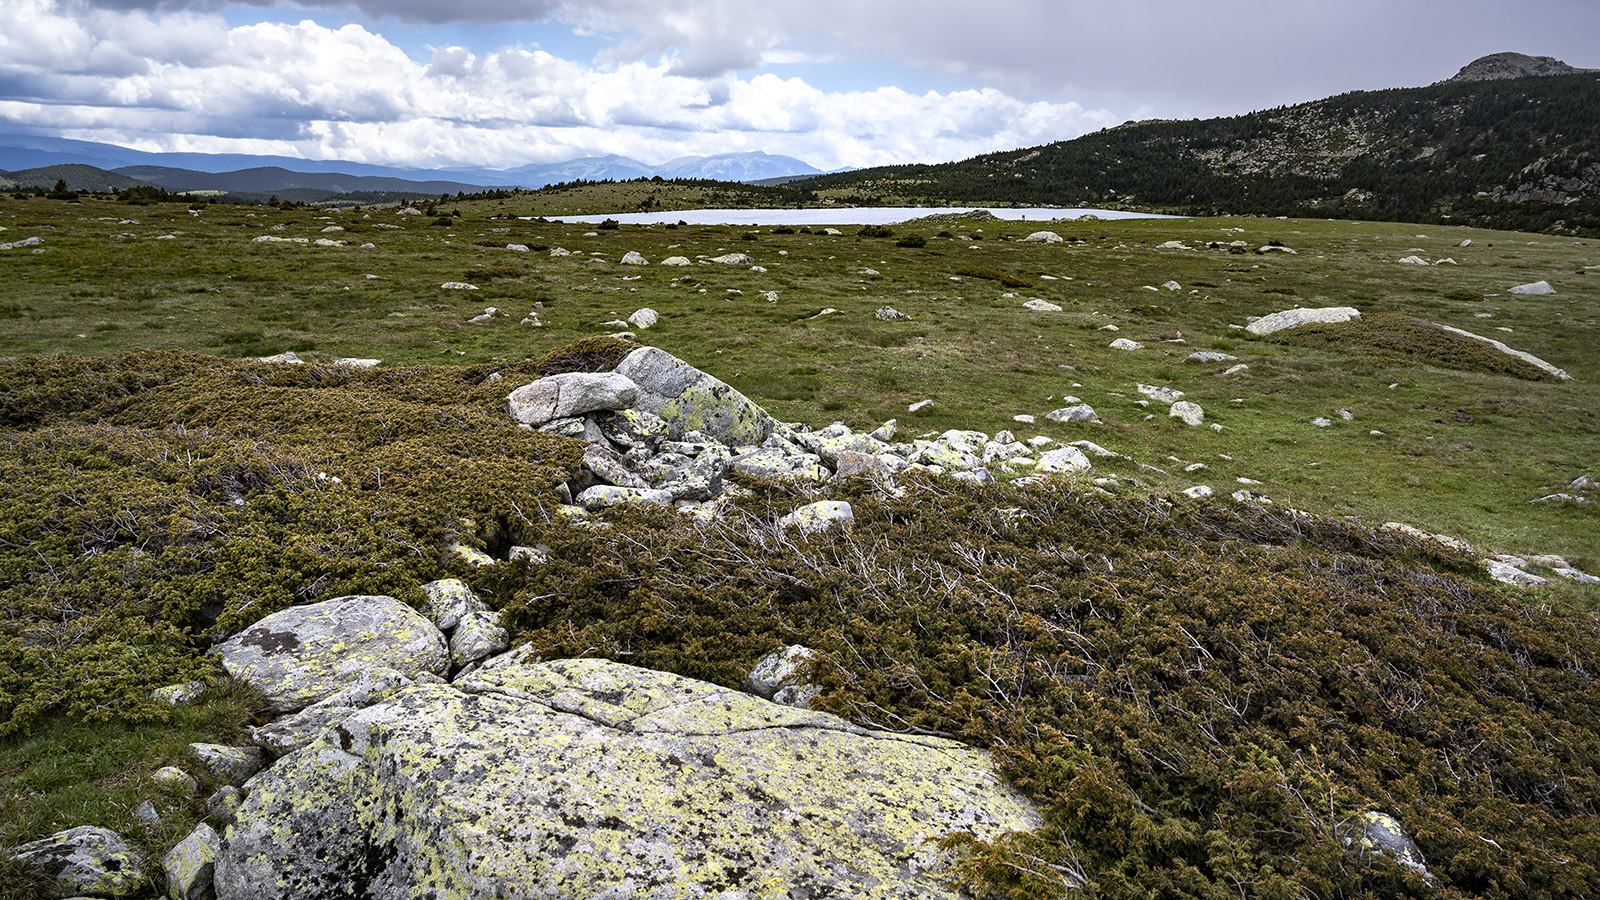 Das Hochplateau am mehr als 2000 m Höhe mit dem Estany Llong. Foto: Hilke Maunder